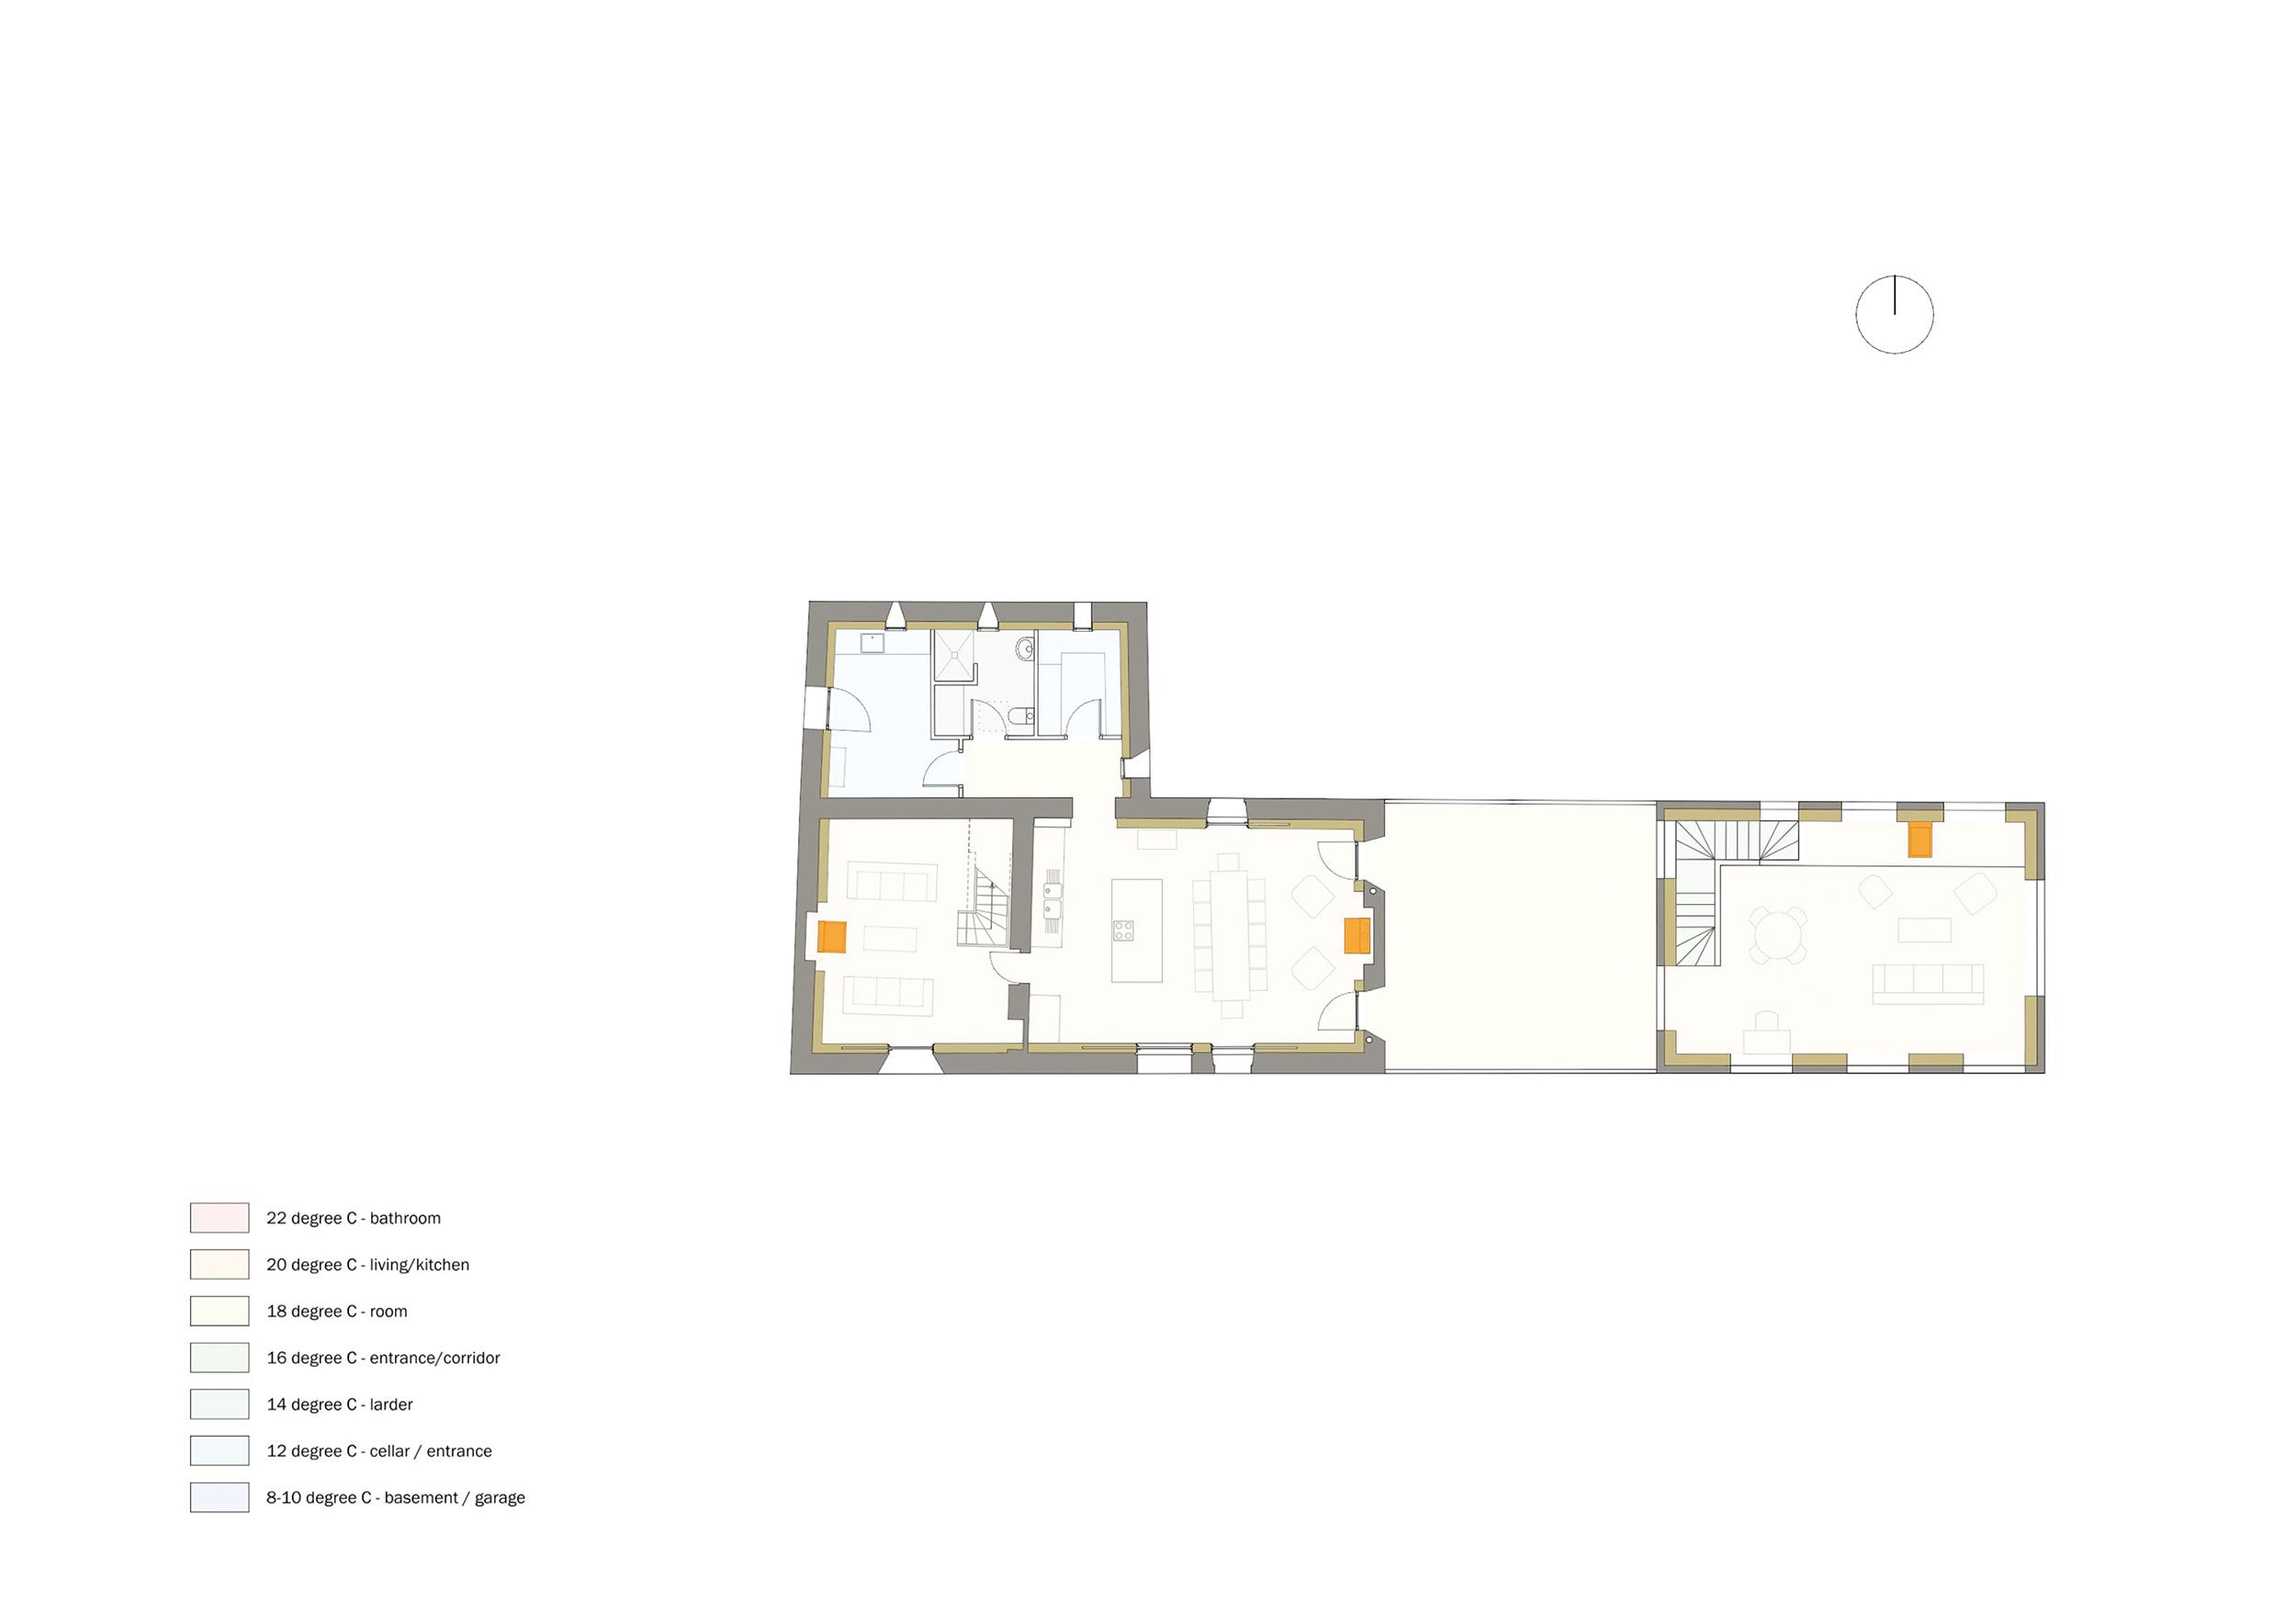 Ground floor environmental plan